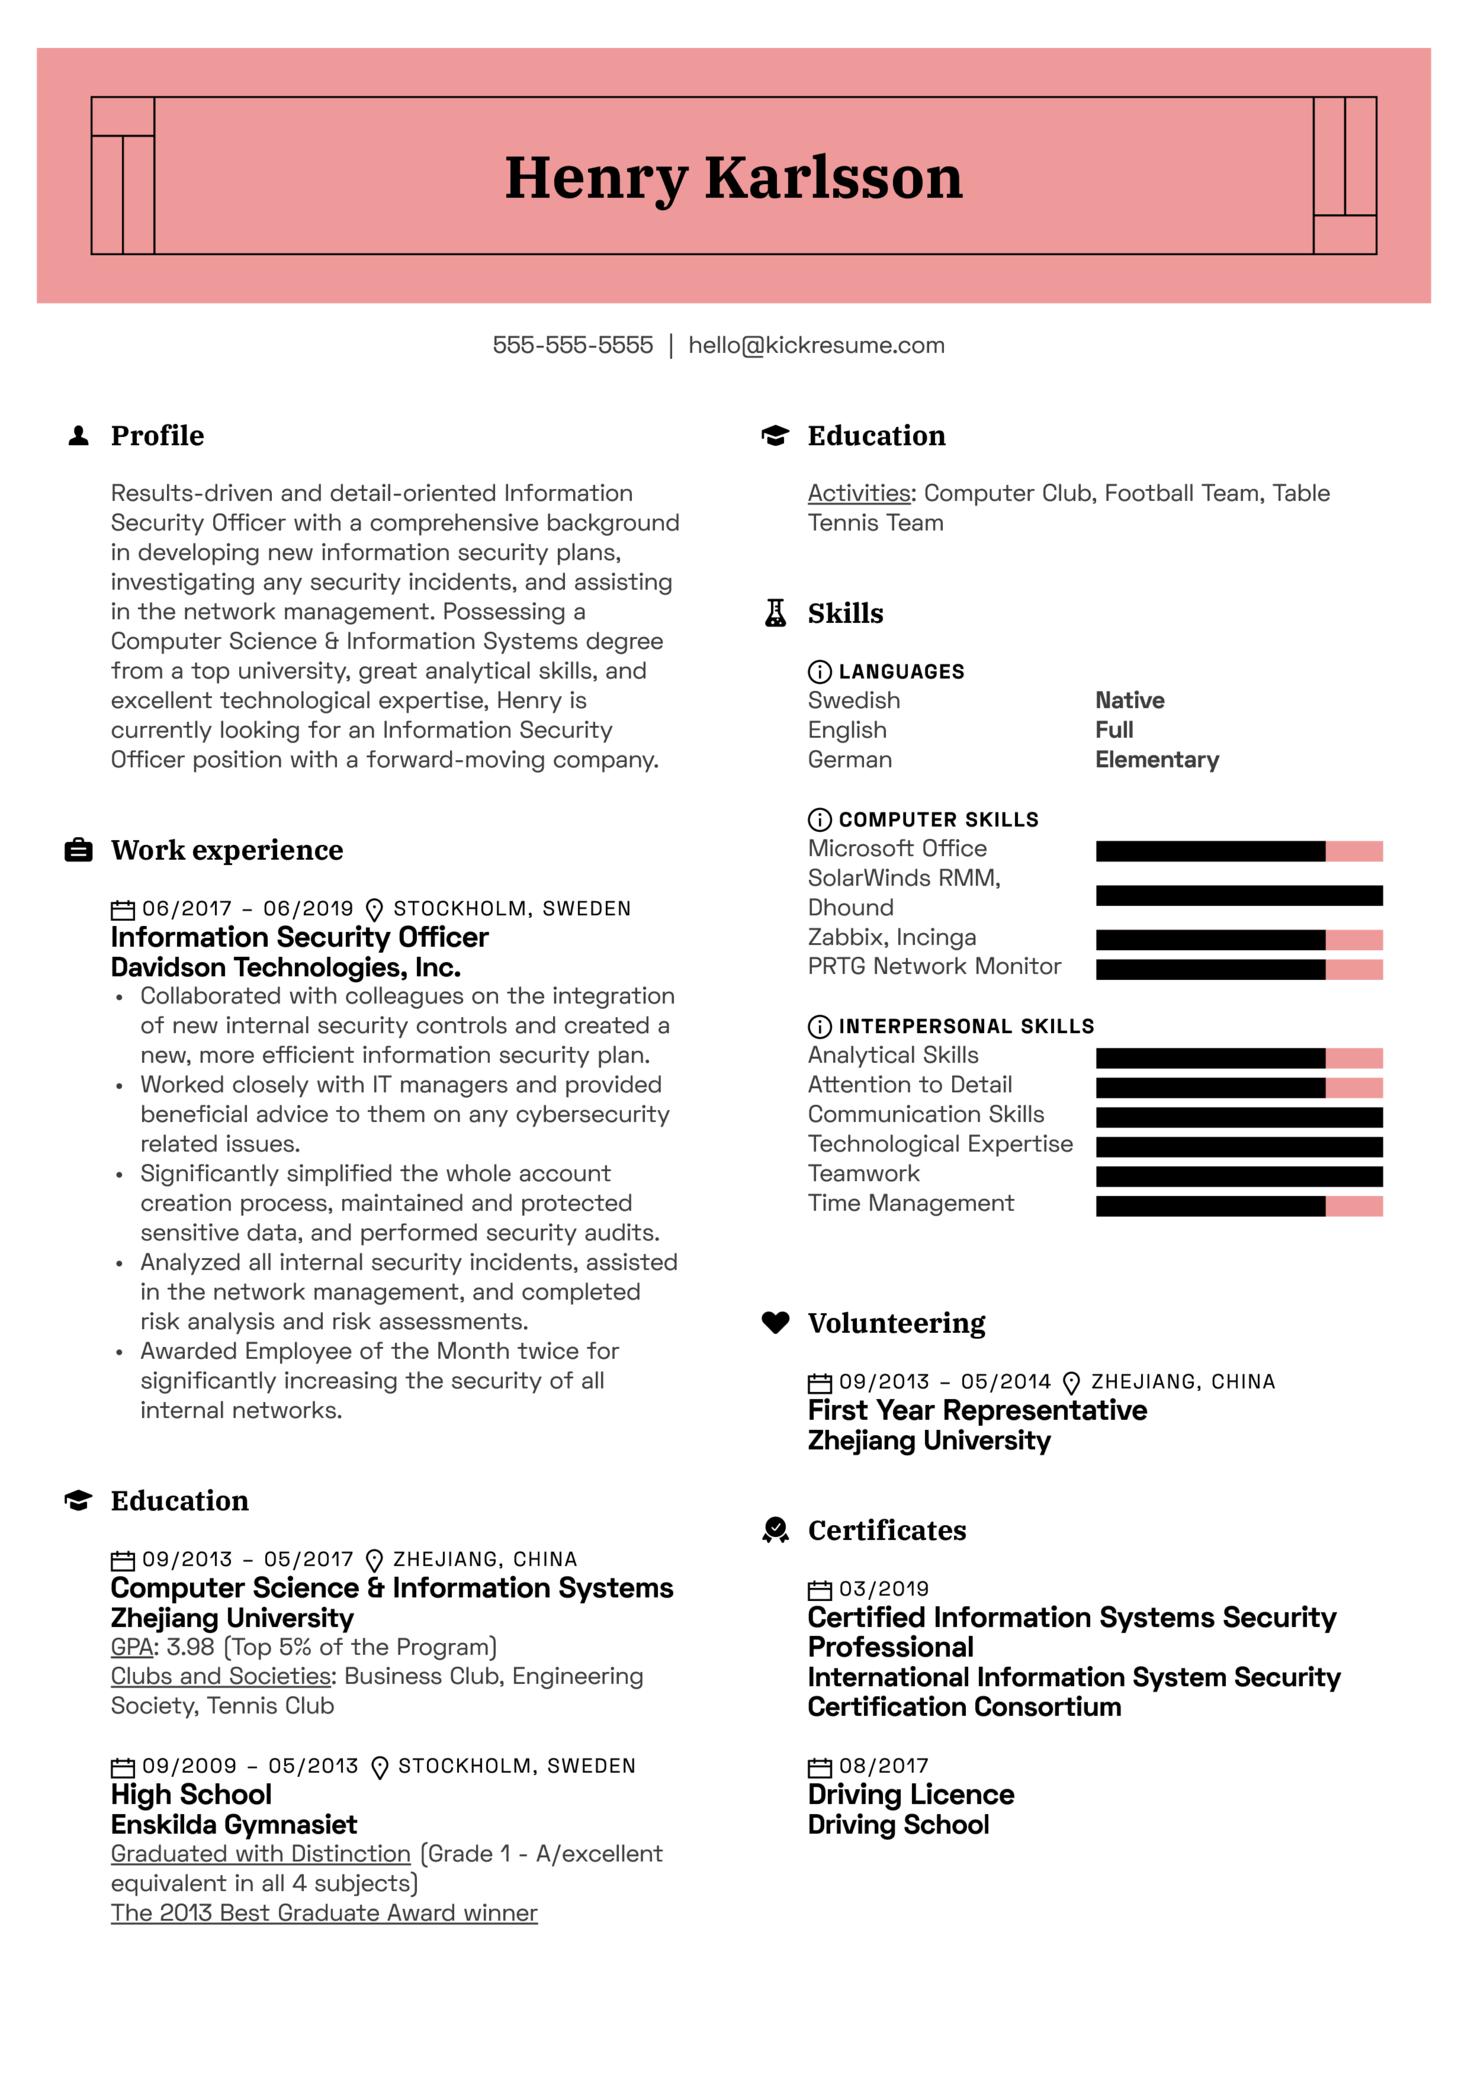 Information Security Officer Resume Sample (Part 1)